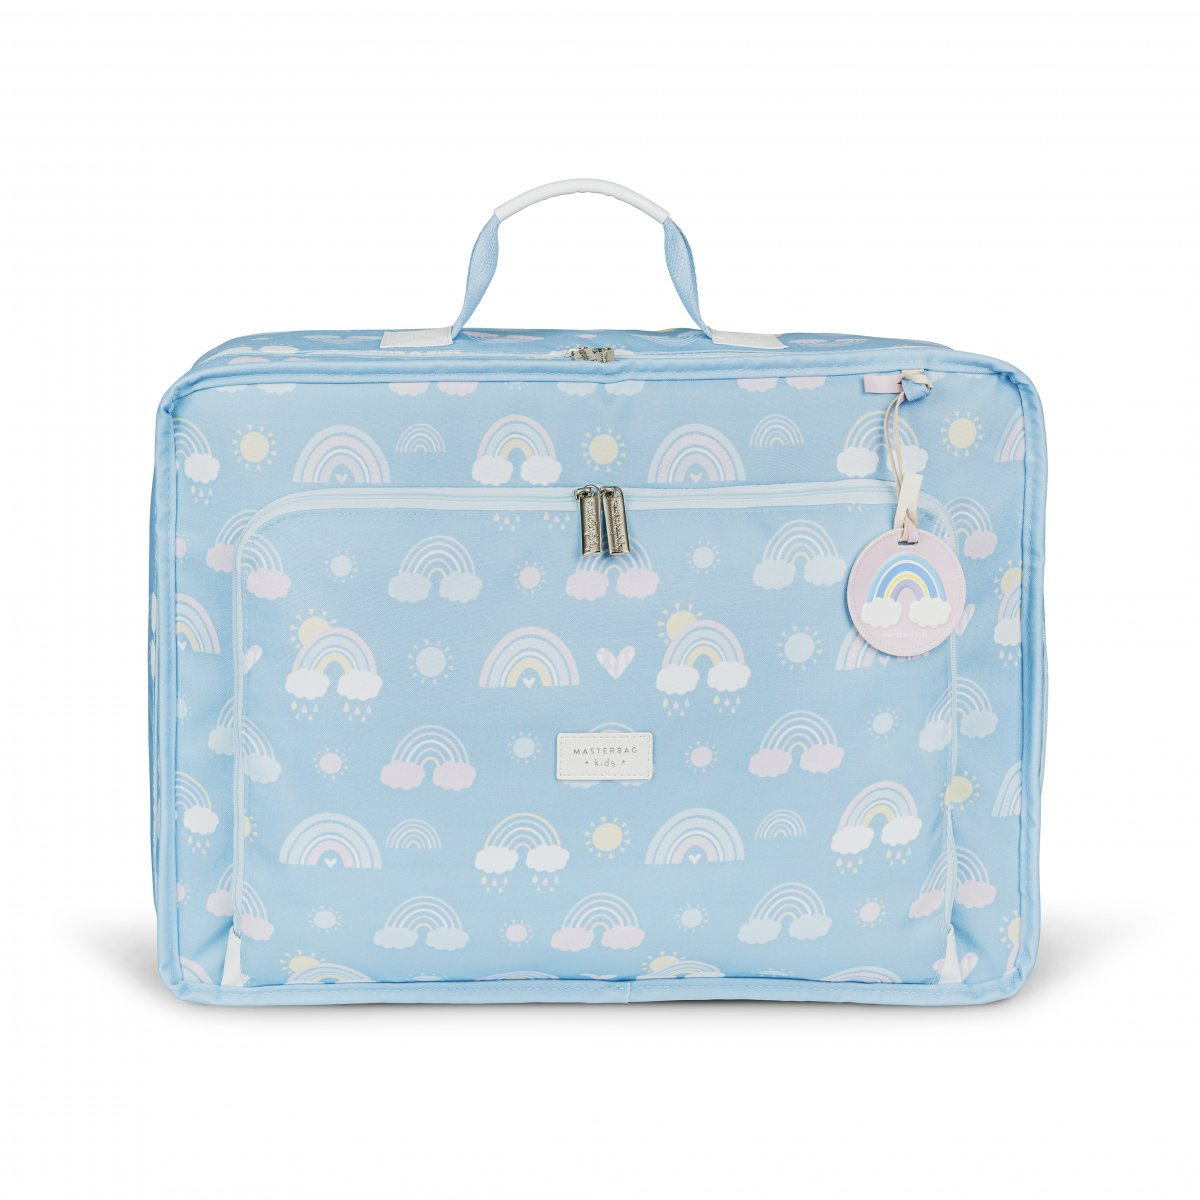 Mala Maternidade Vintage Arco-íris Masterbag Azul